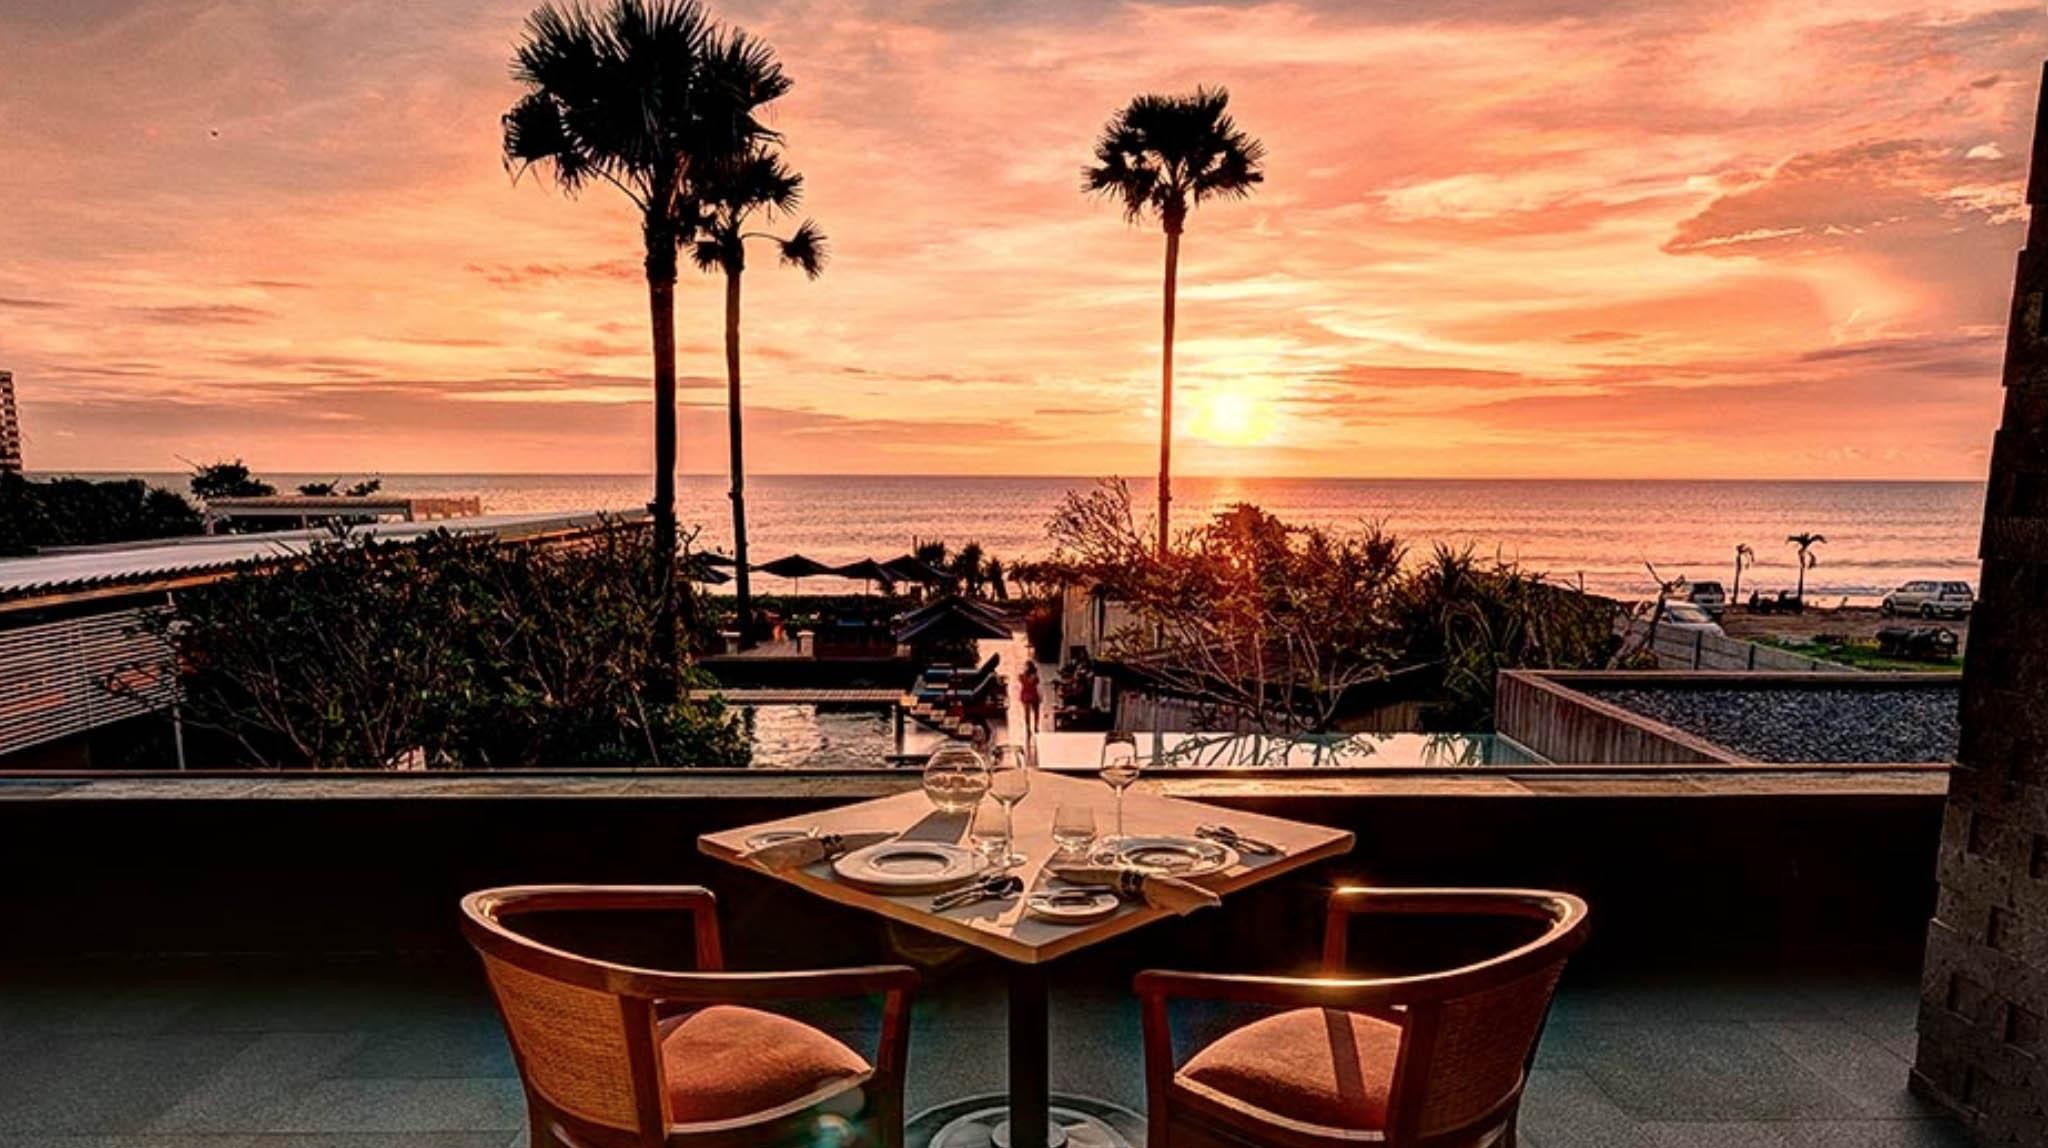 Mozaic Beachclub - Pantai Batu Belig, Bali, Indonesia